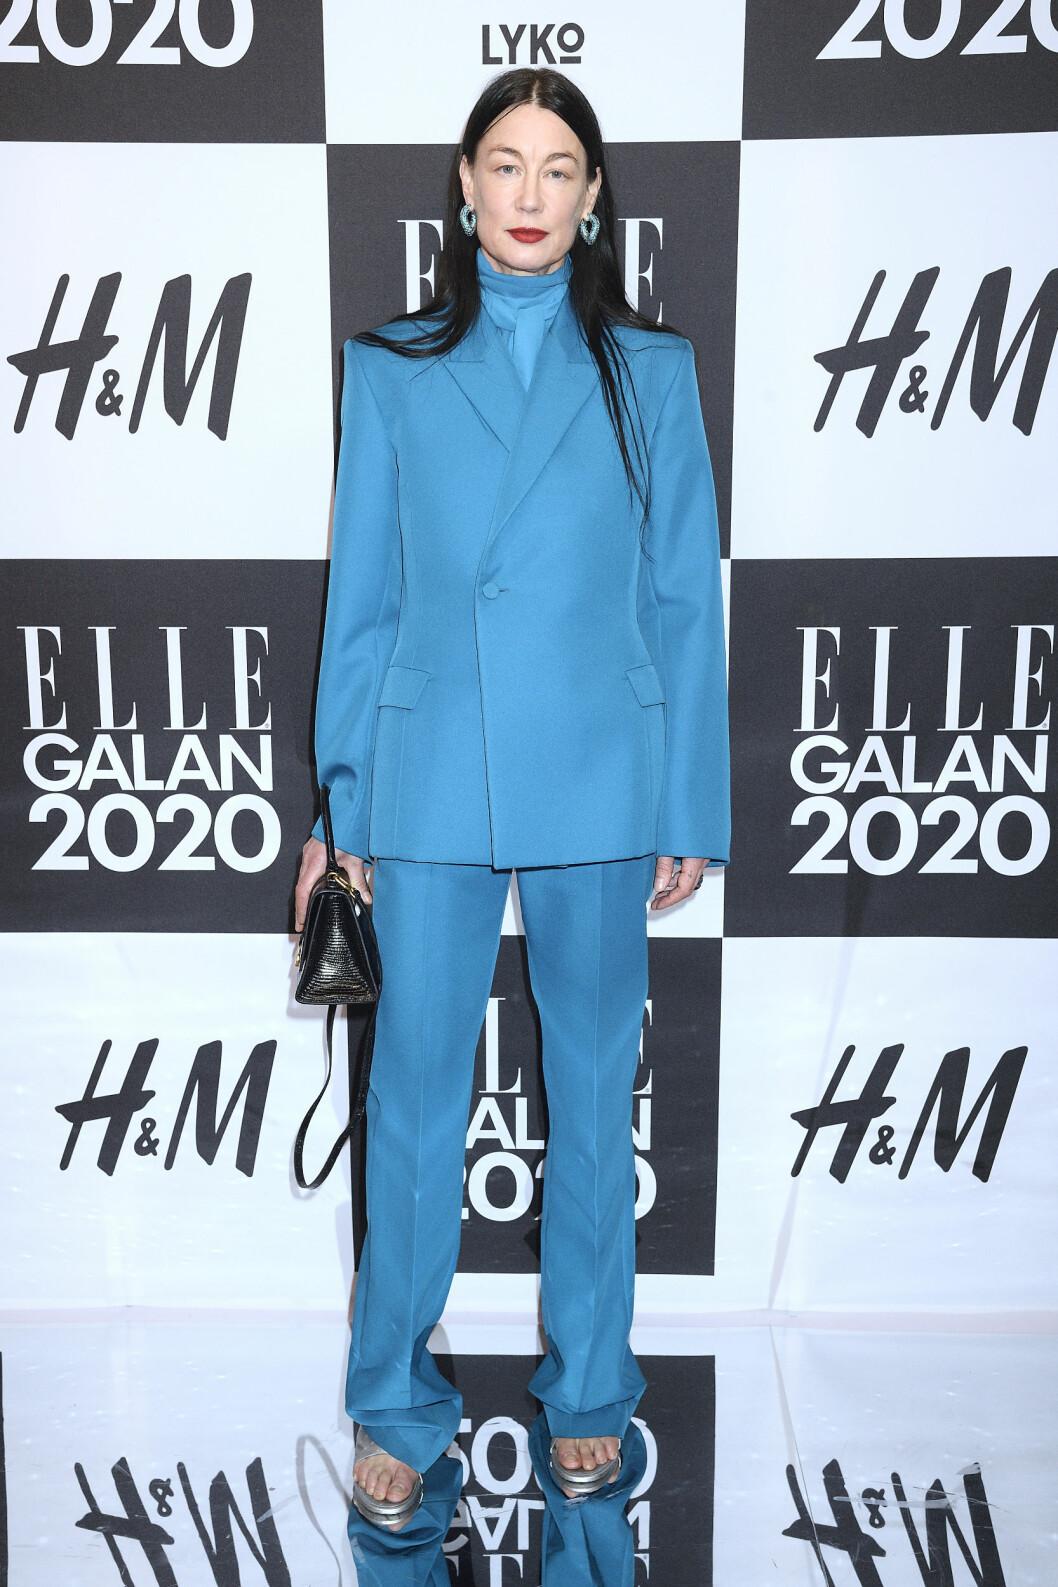 Modellen Ursula Wångander med blå kostym